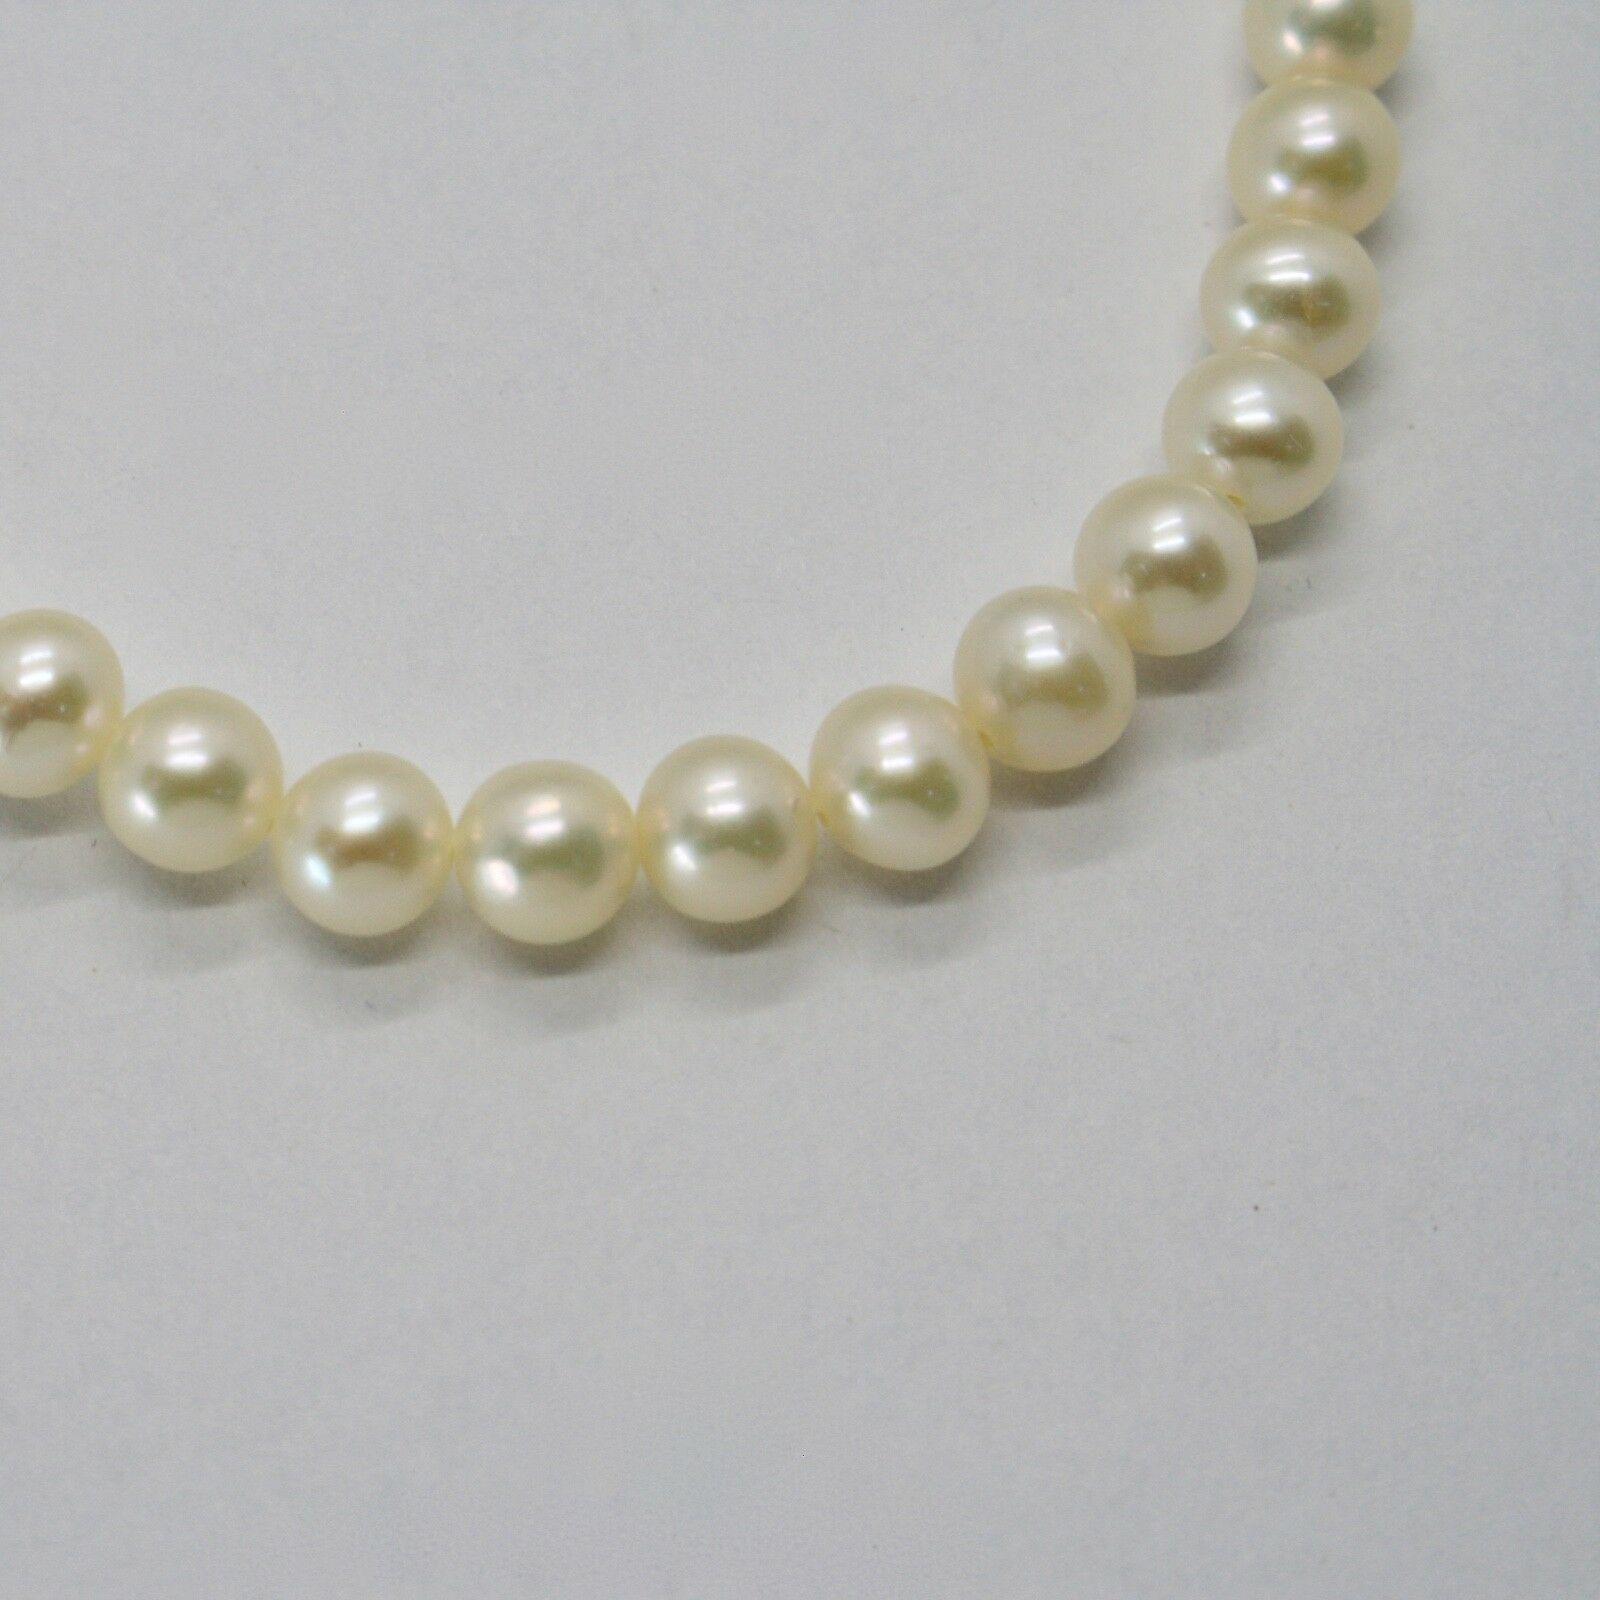 Bracelet en or Blanc 18KT et Argent 925 avec Perles 5.5 6 mm Beau Boîte image 6